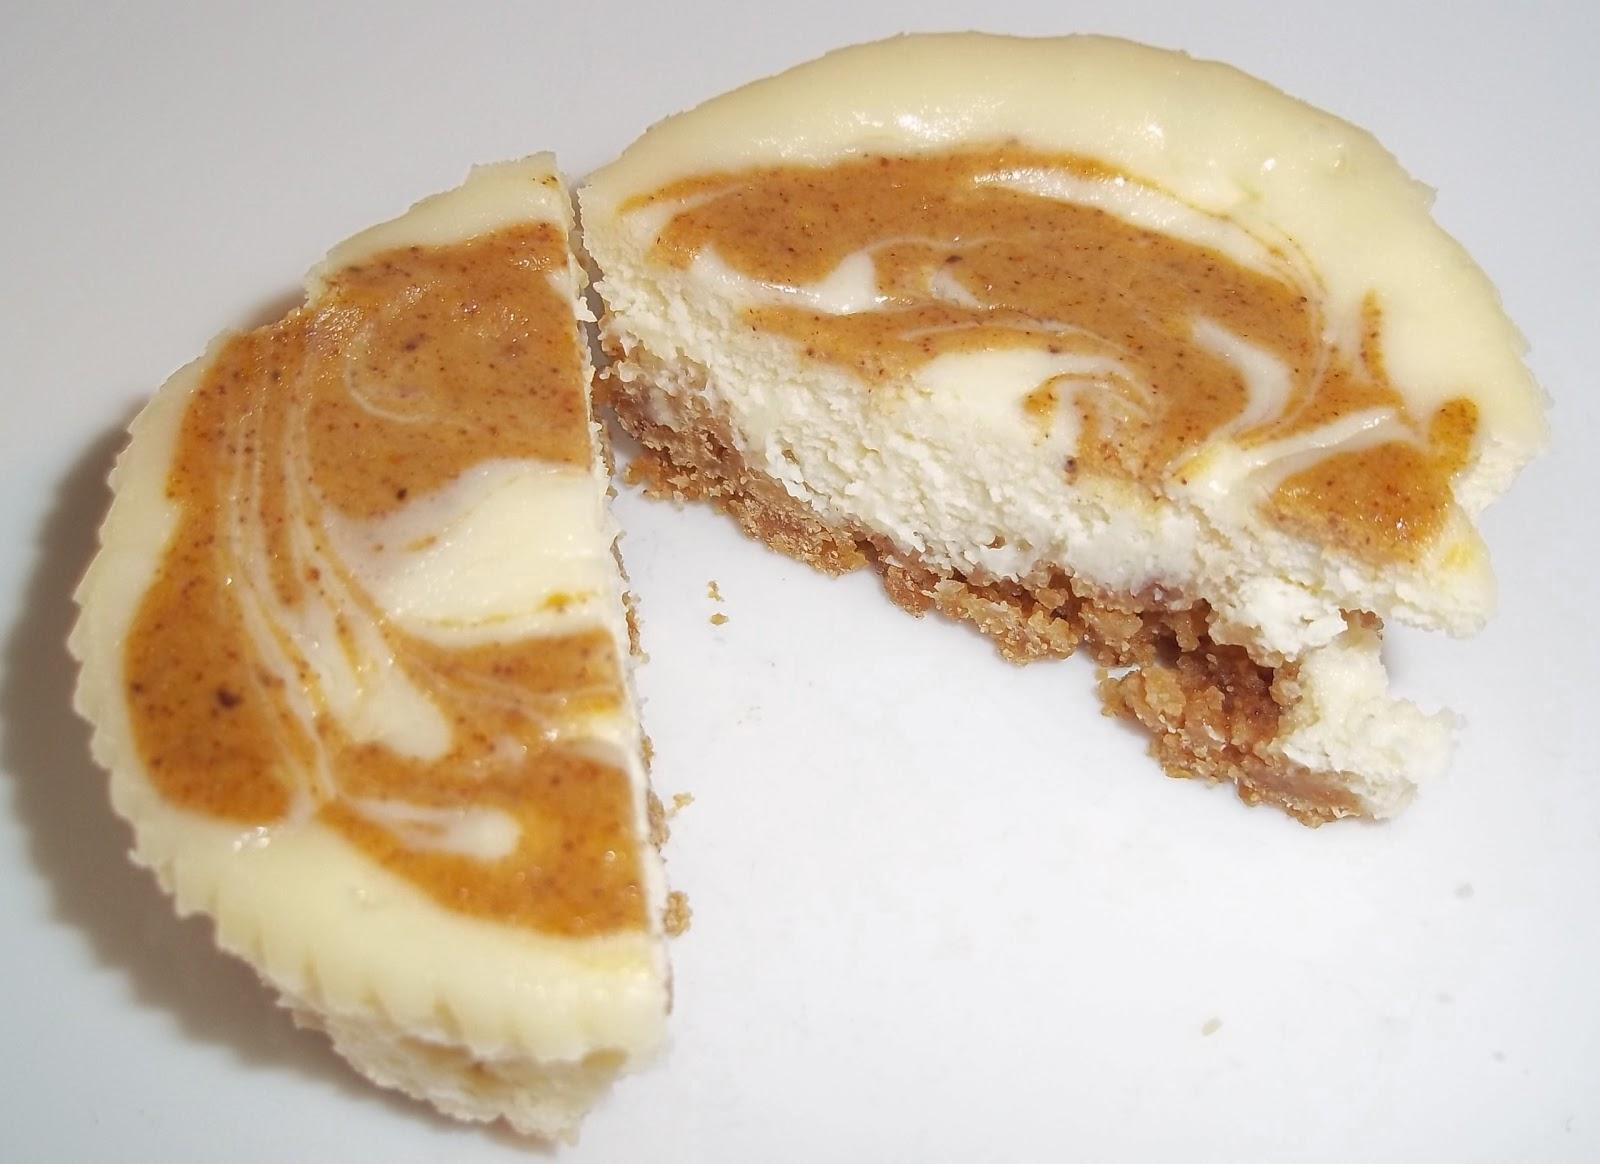 The Daily Smash: Mini Pumpkin Swirl Cheesecakes